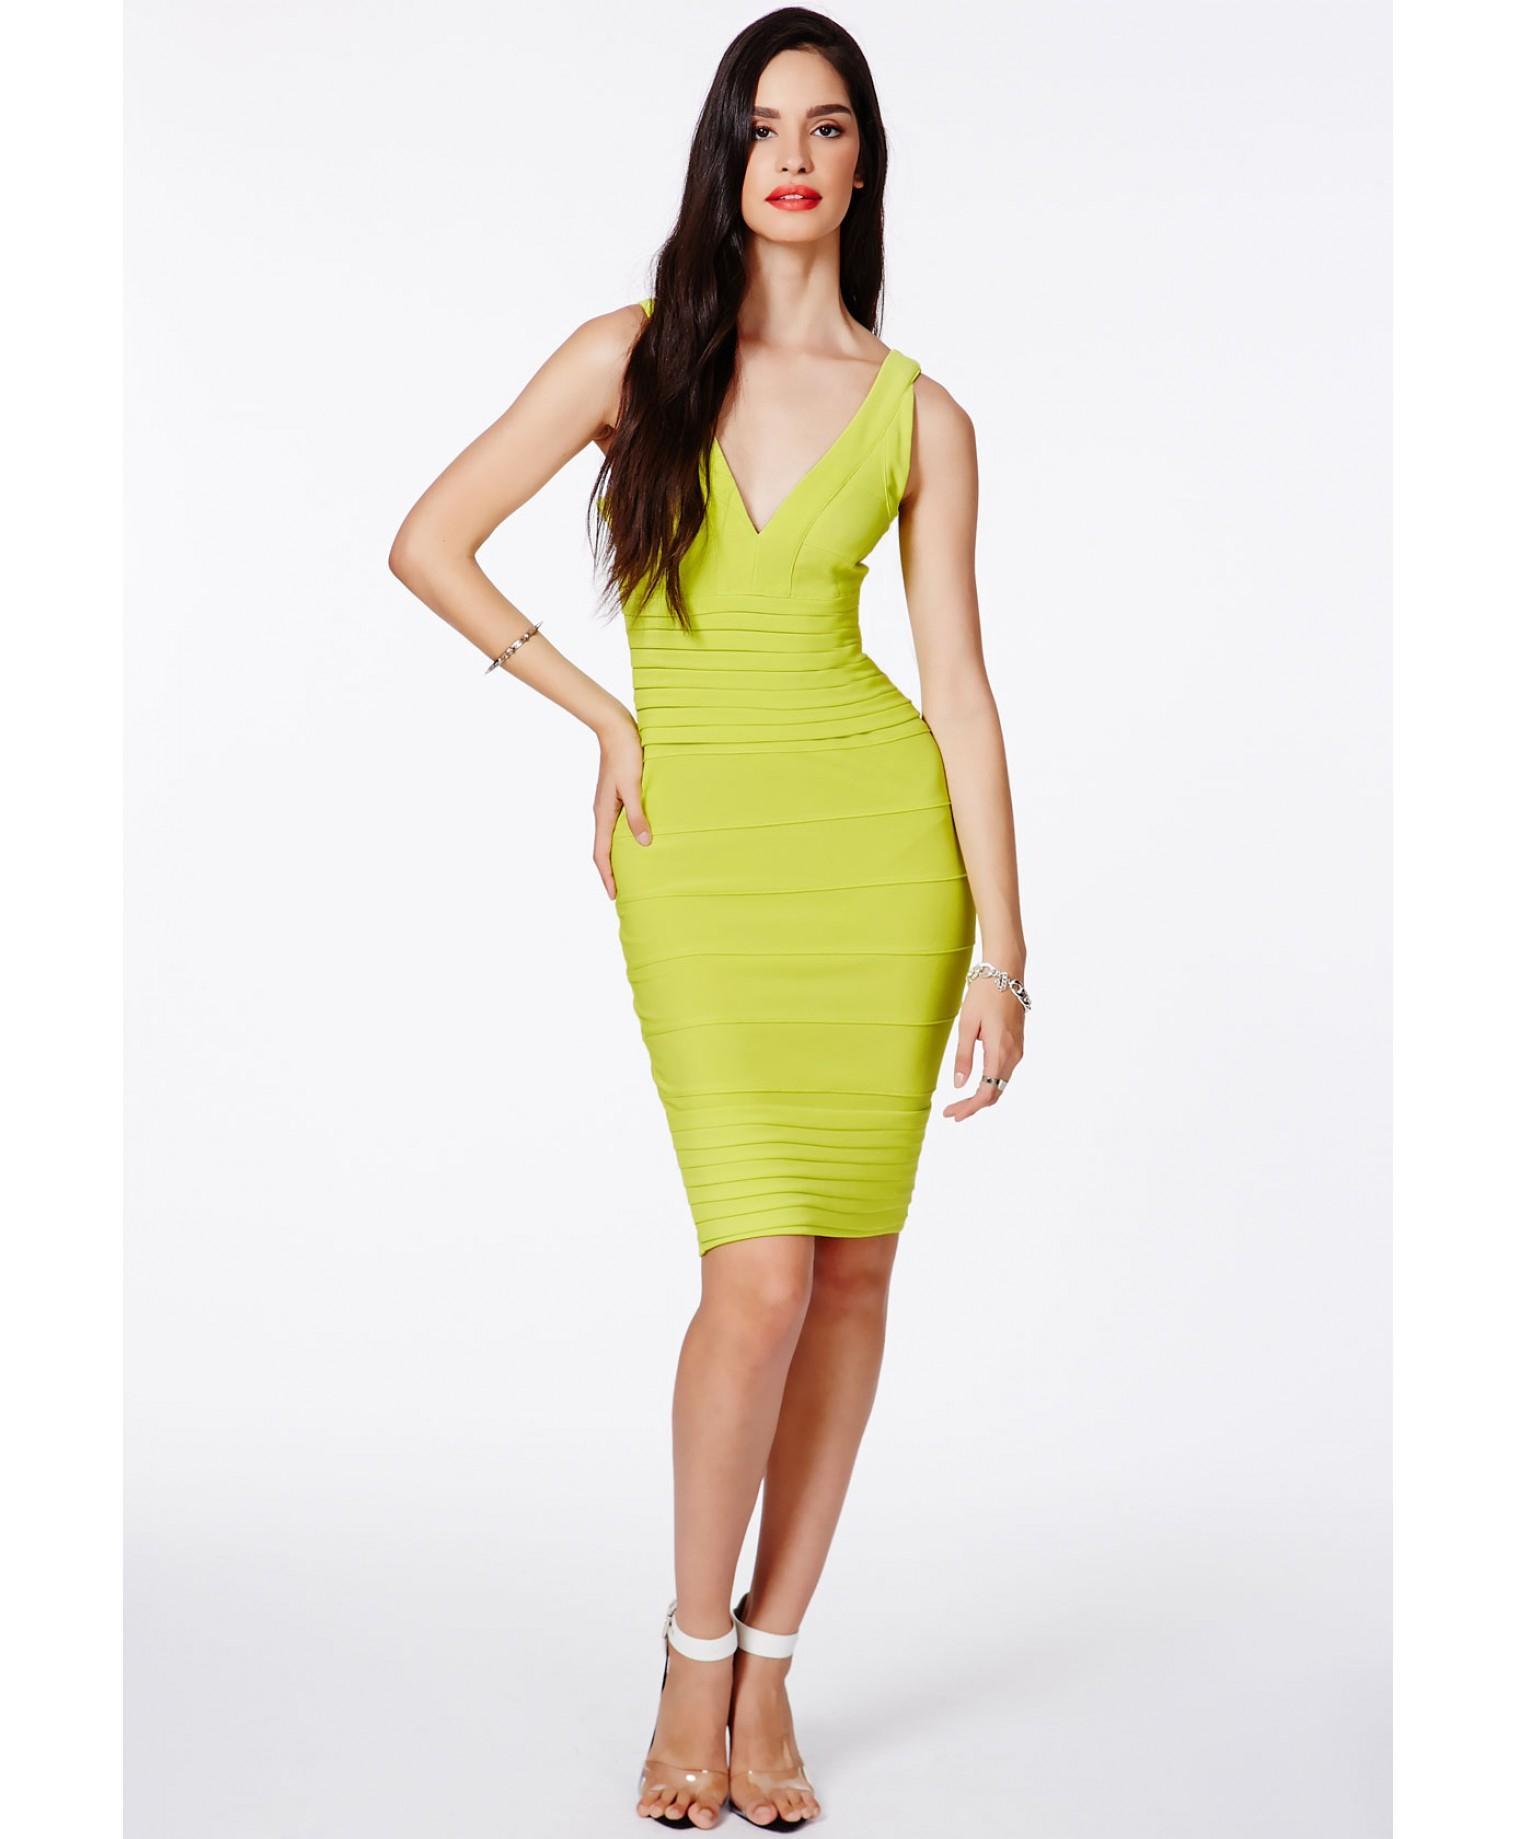 Missguided Mulan Bandage Bodycon Midi Dress in Lime in Green - Lyst af82c4f2ec